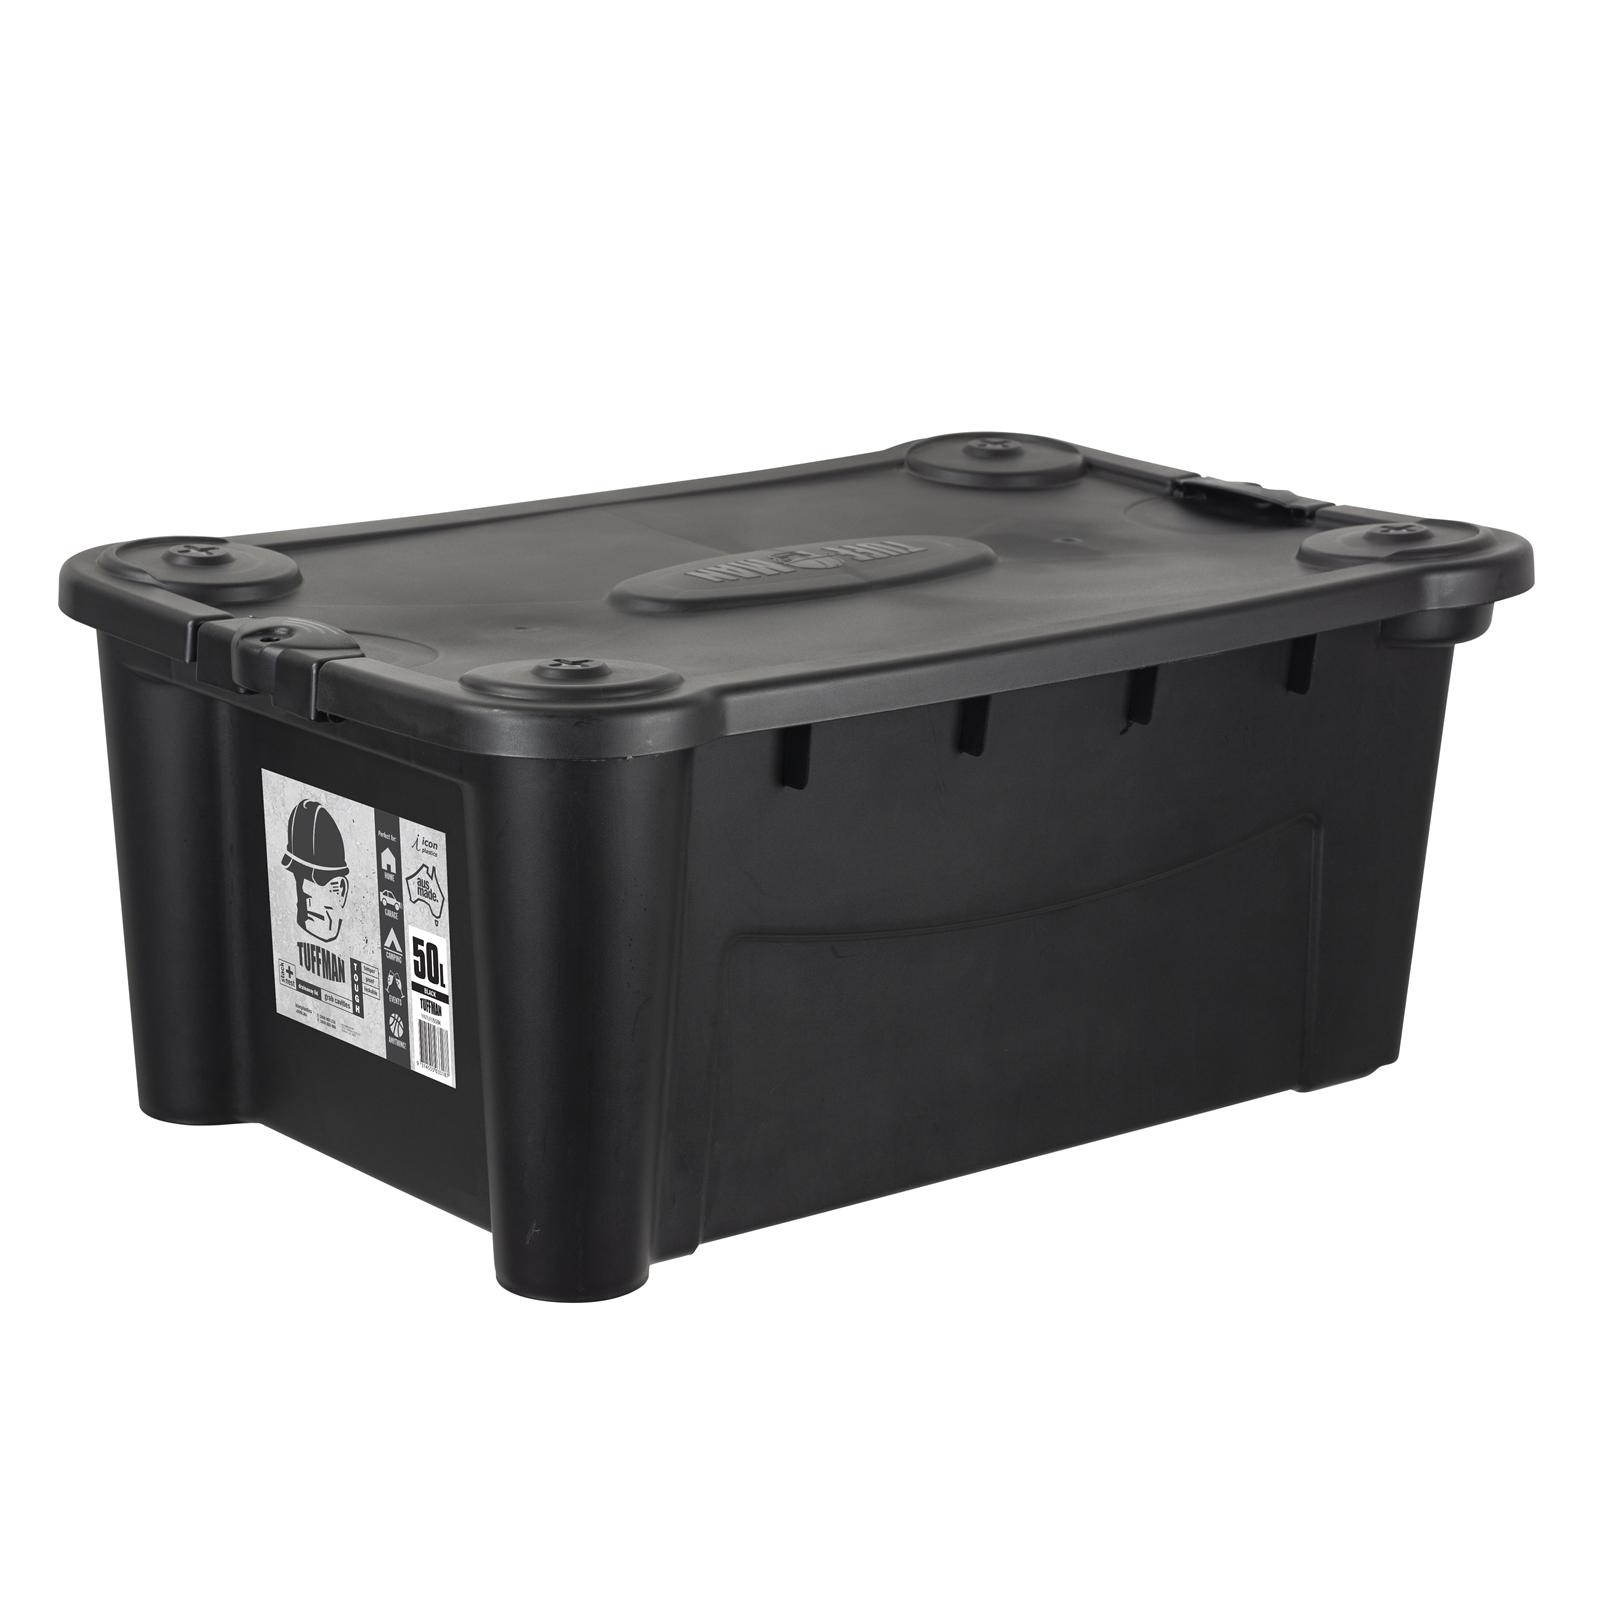 Icon Plastics 50L Black Tuffman Heavy Duty Storage Container